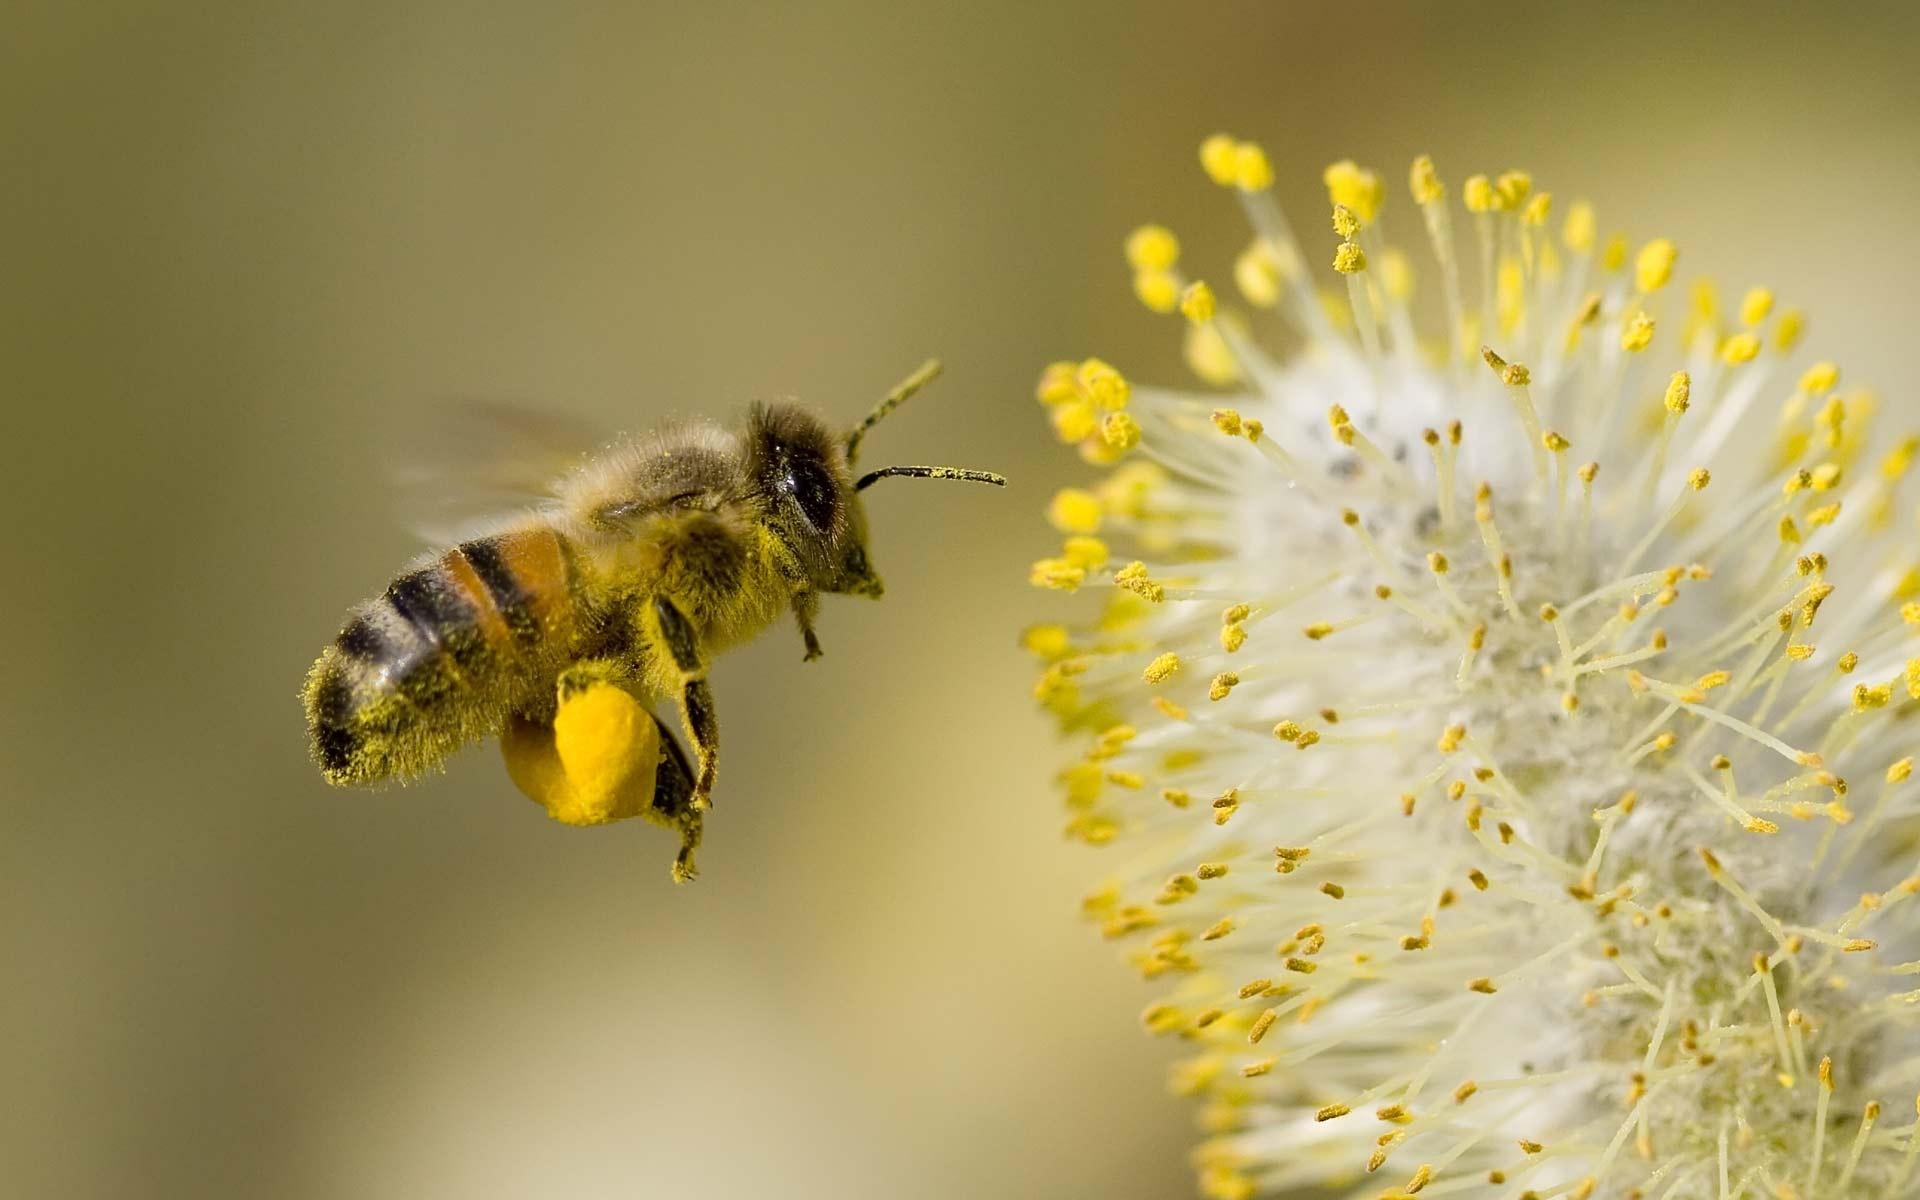 Honey-Bee-Flowers-Widescreen.jpg